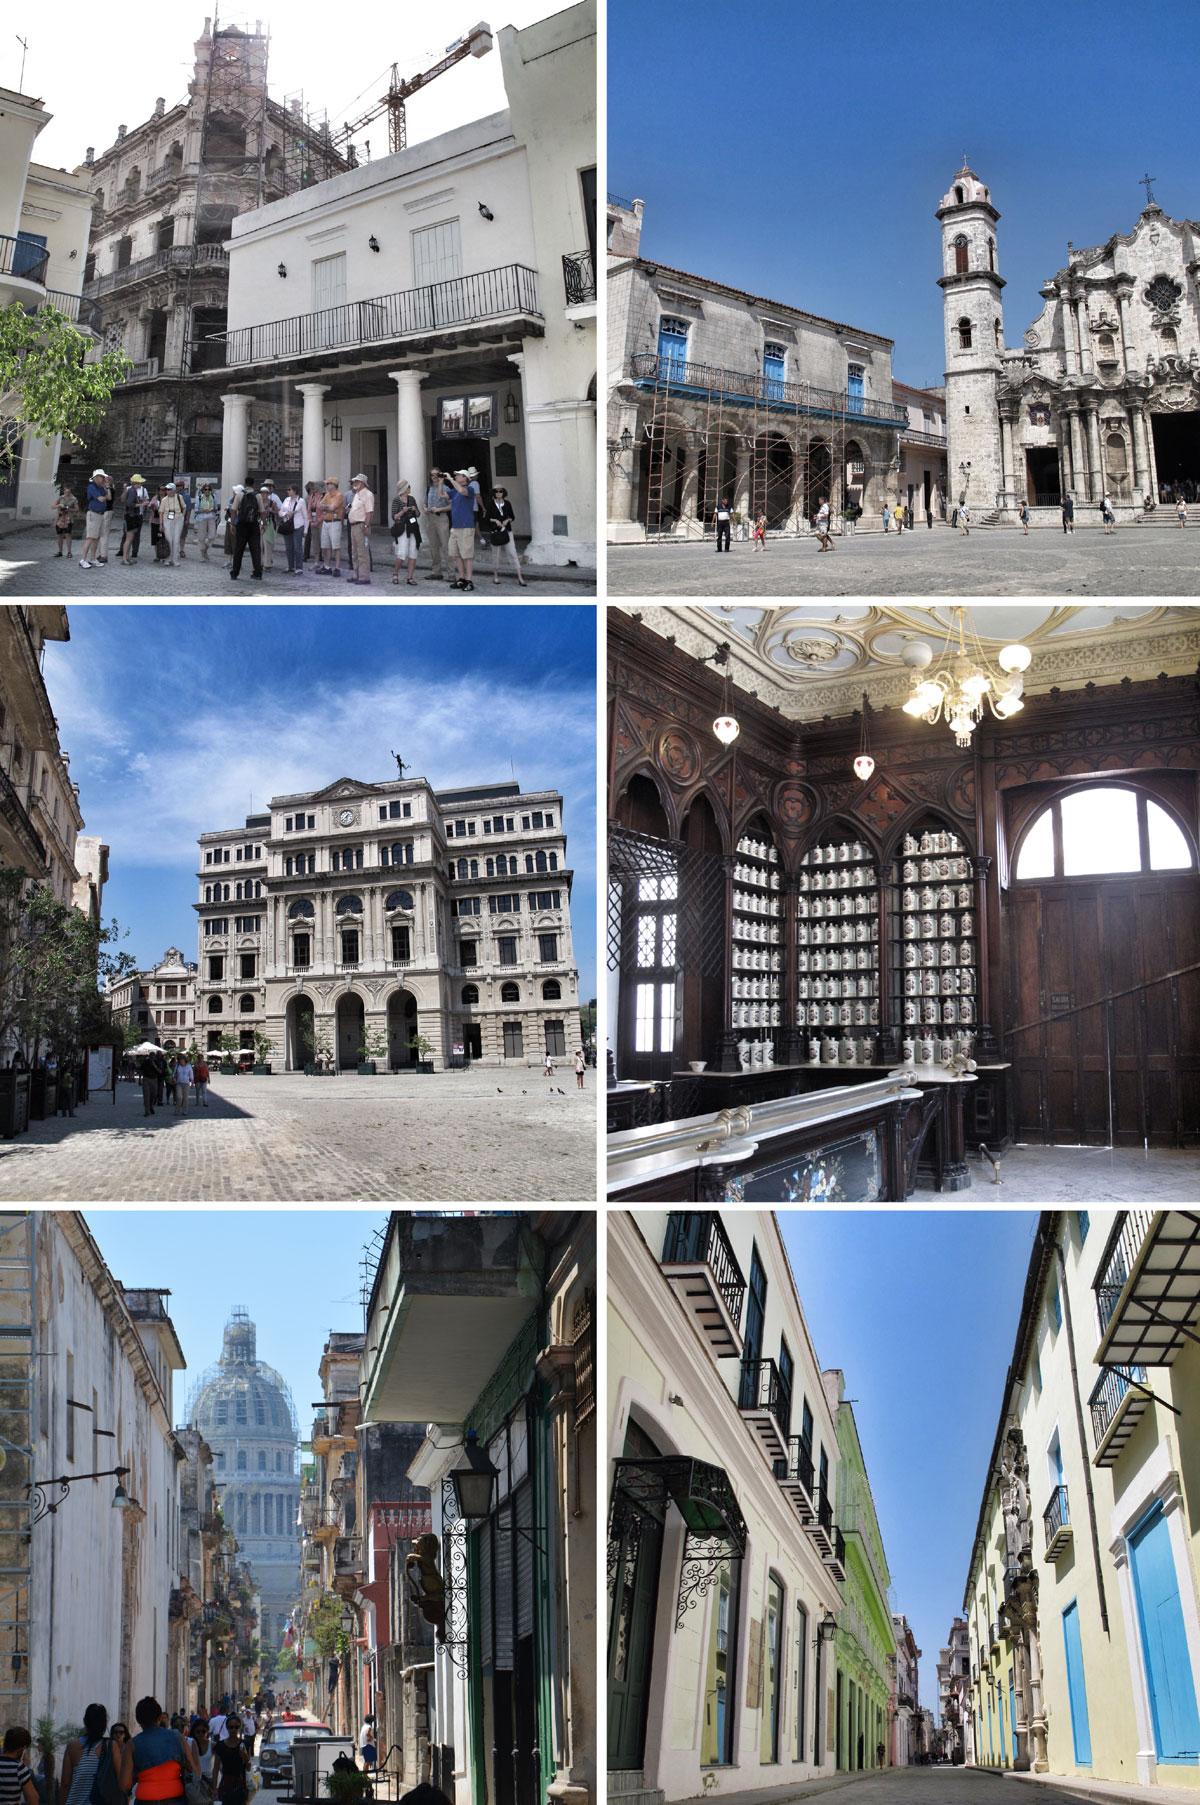 habana vieja_plaza de armas_plaza vieja_plaza catedral_plaza san franciso de asis_restauracion